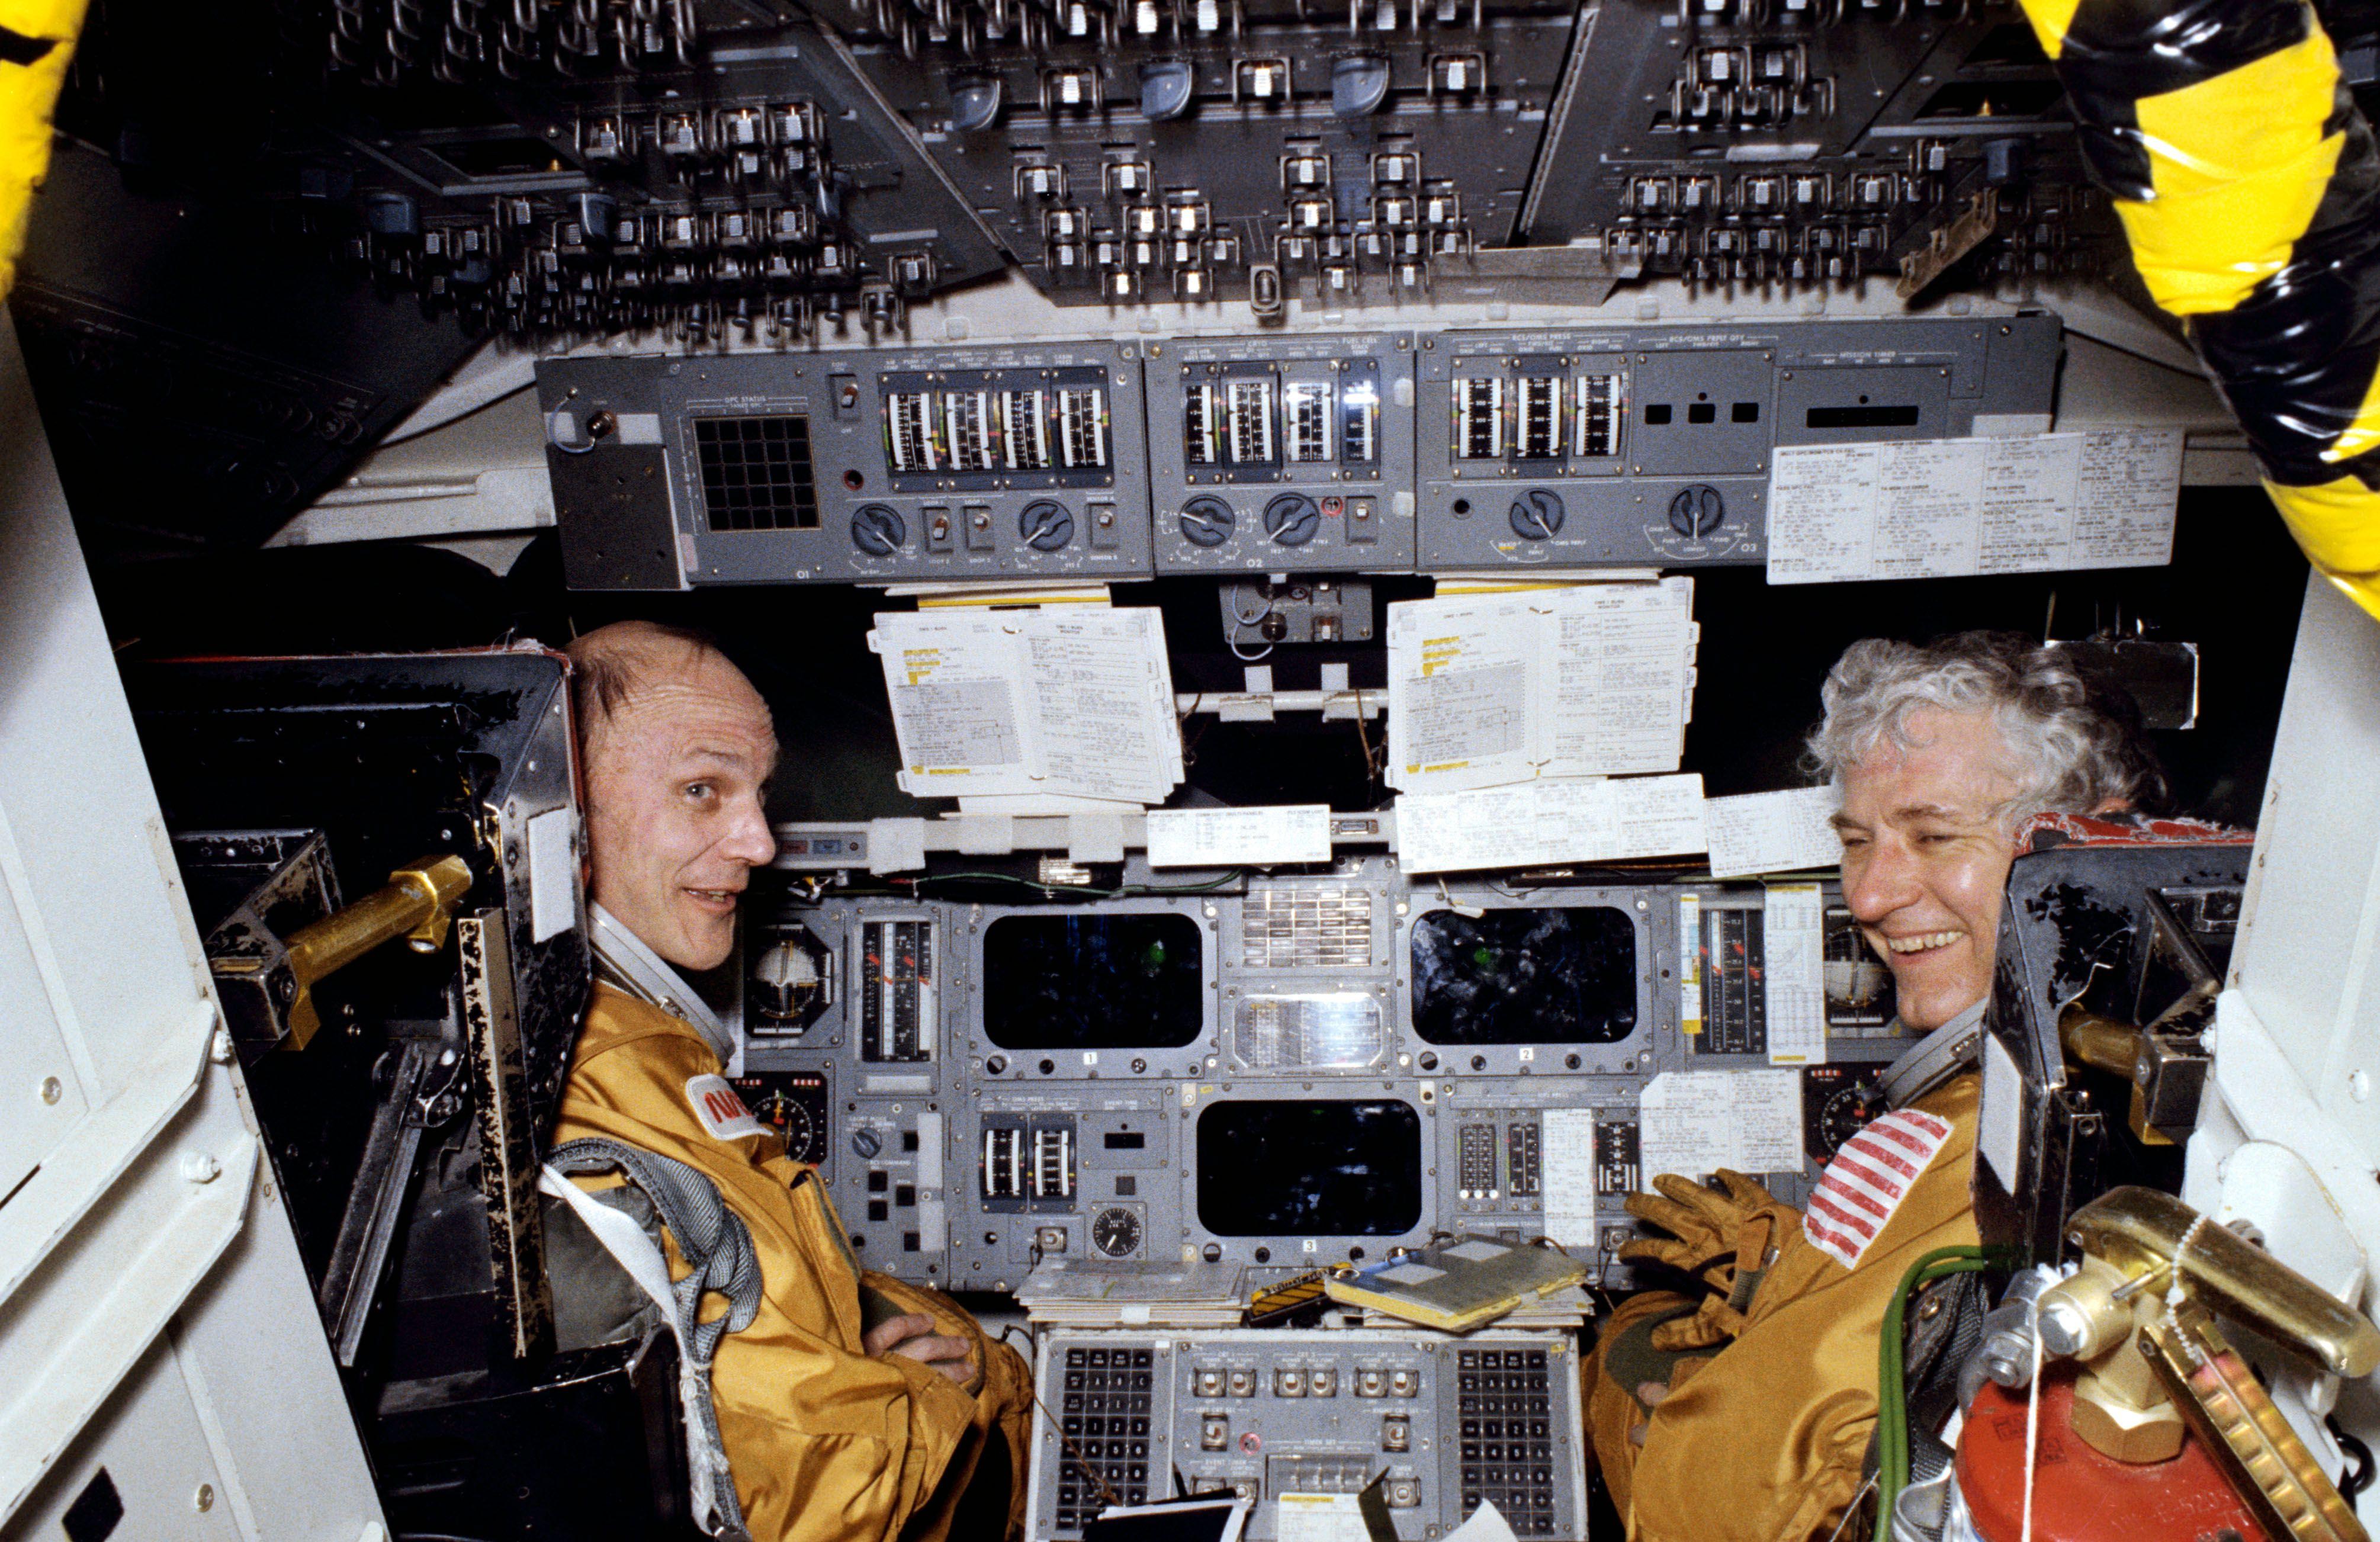 Biography Of Ken Mattingly Apollo And Shuttle Astronaut